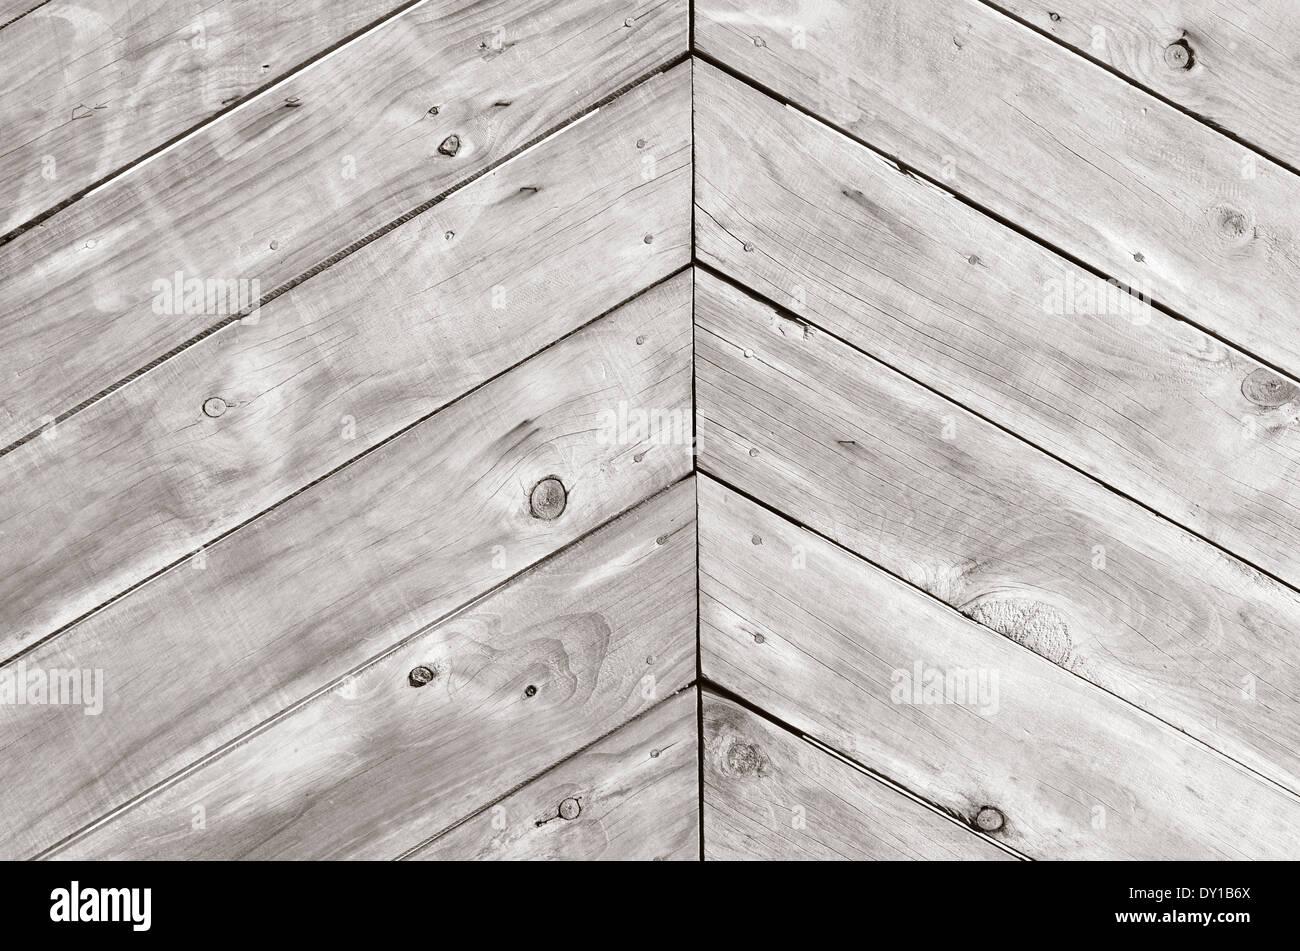 Triangle shape of empty wood planks background texture. (BW) - Stock Image